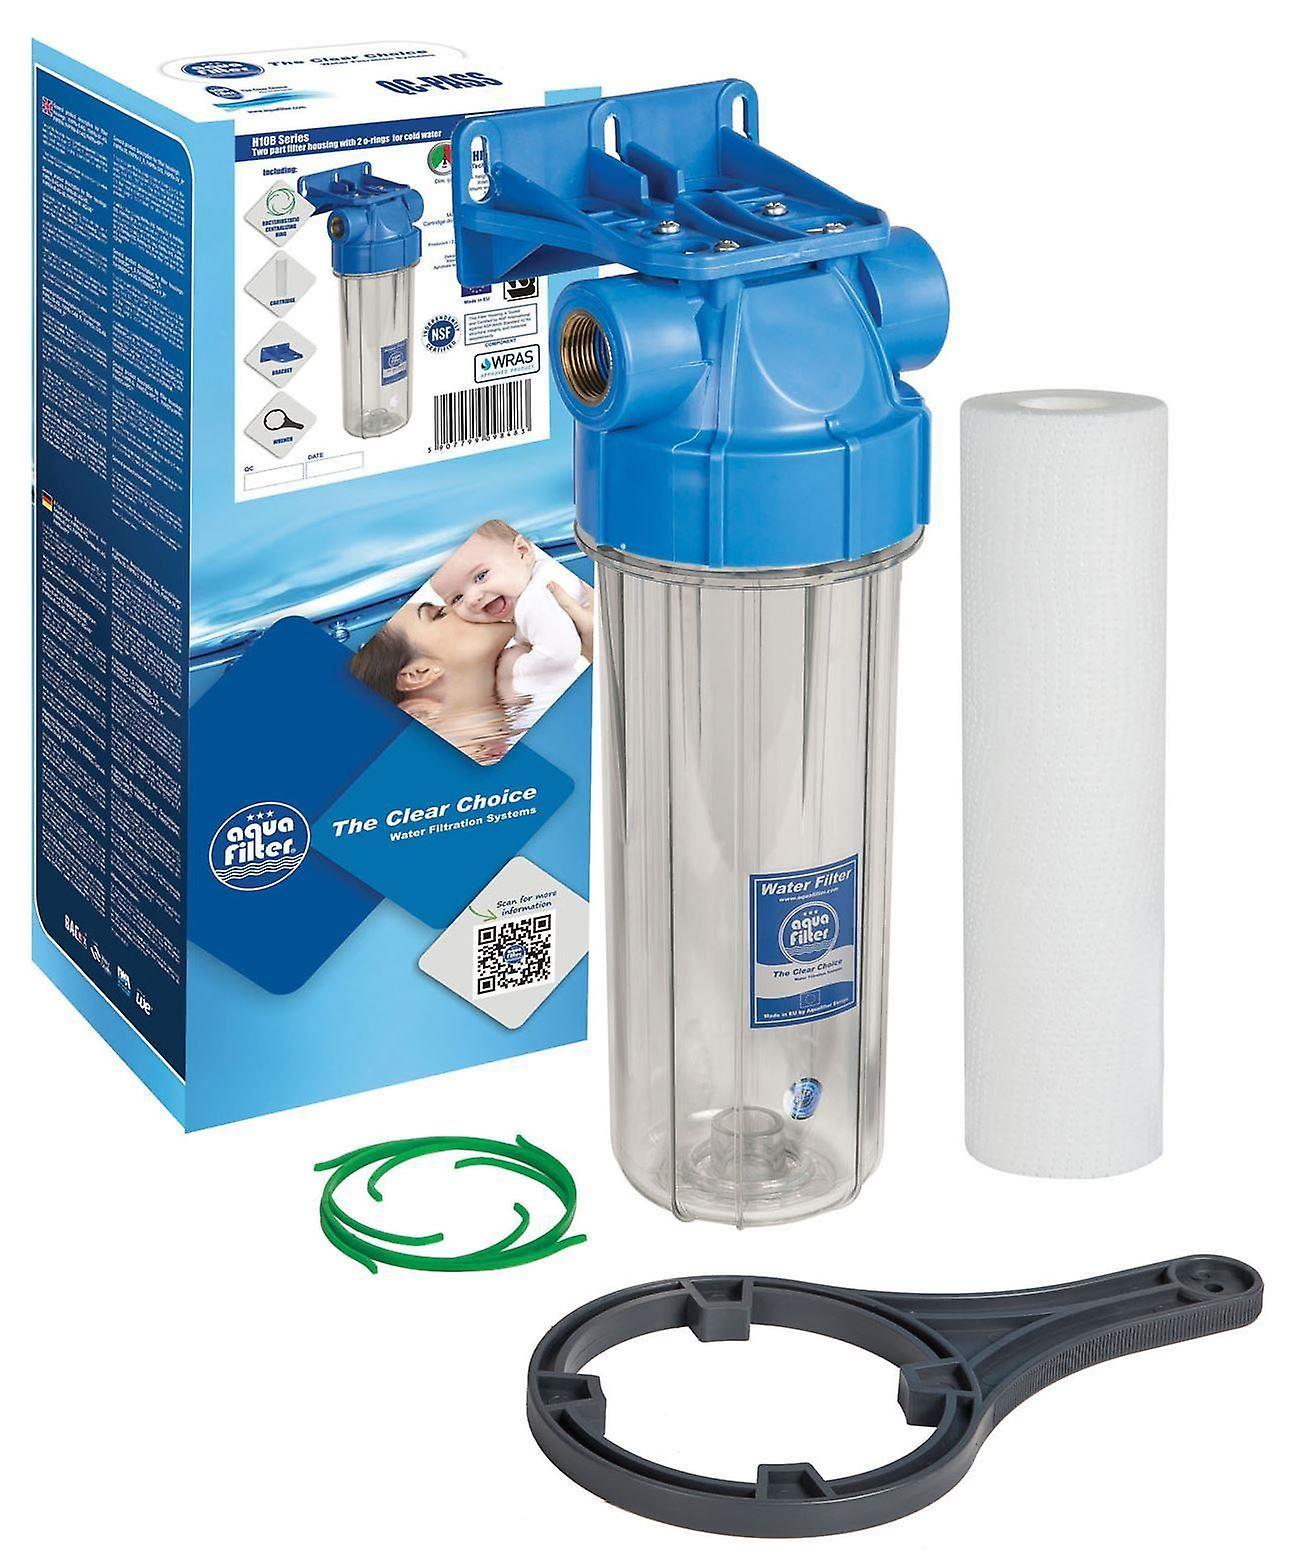 1 cold water filtration in line purify system housing whole filter set fruugo. Black Bedroom Furniture Sets. Home Design Ideas